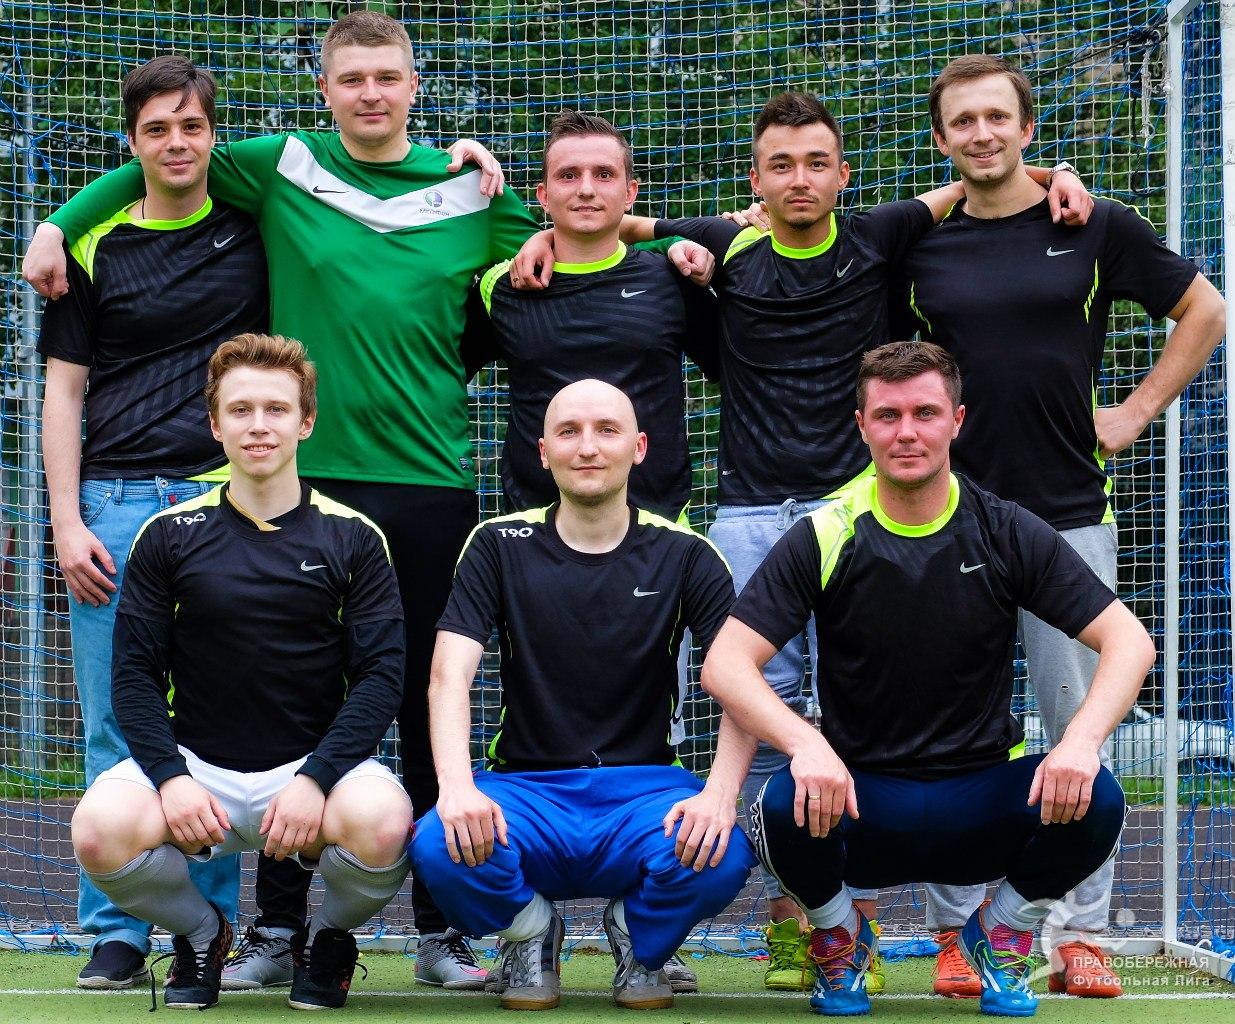 Футбольная правобережная лига